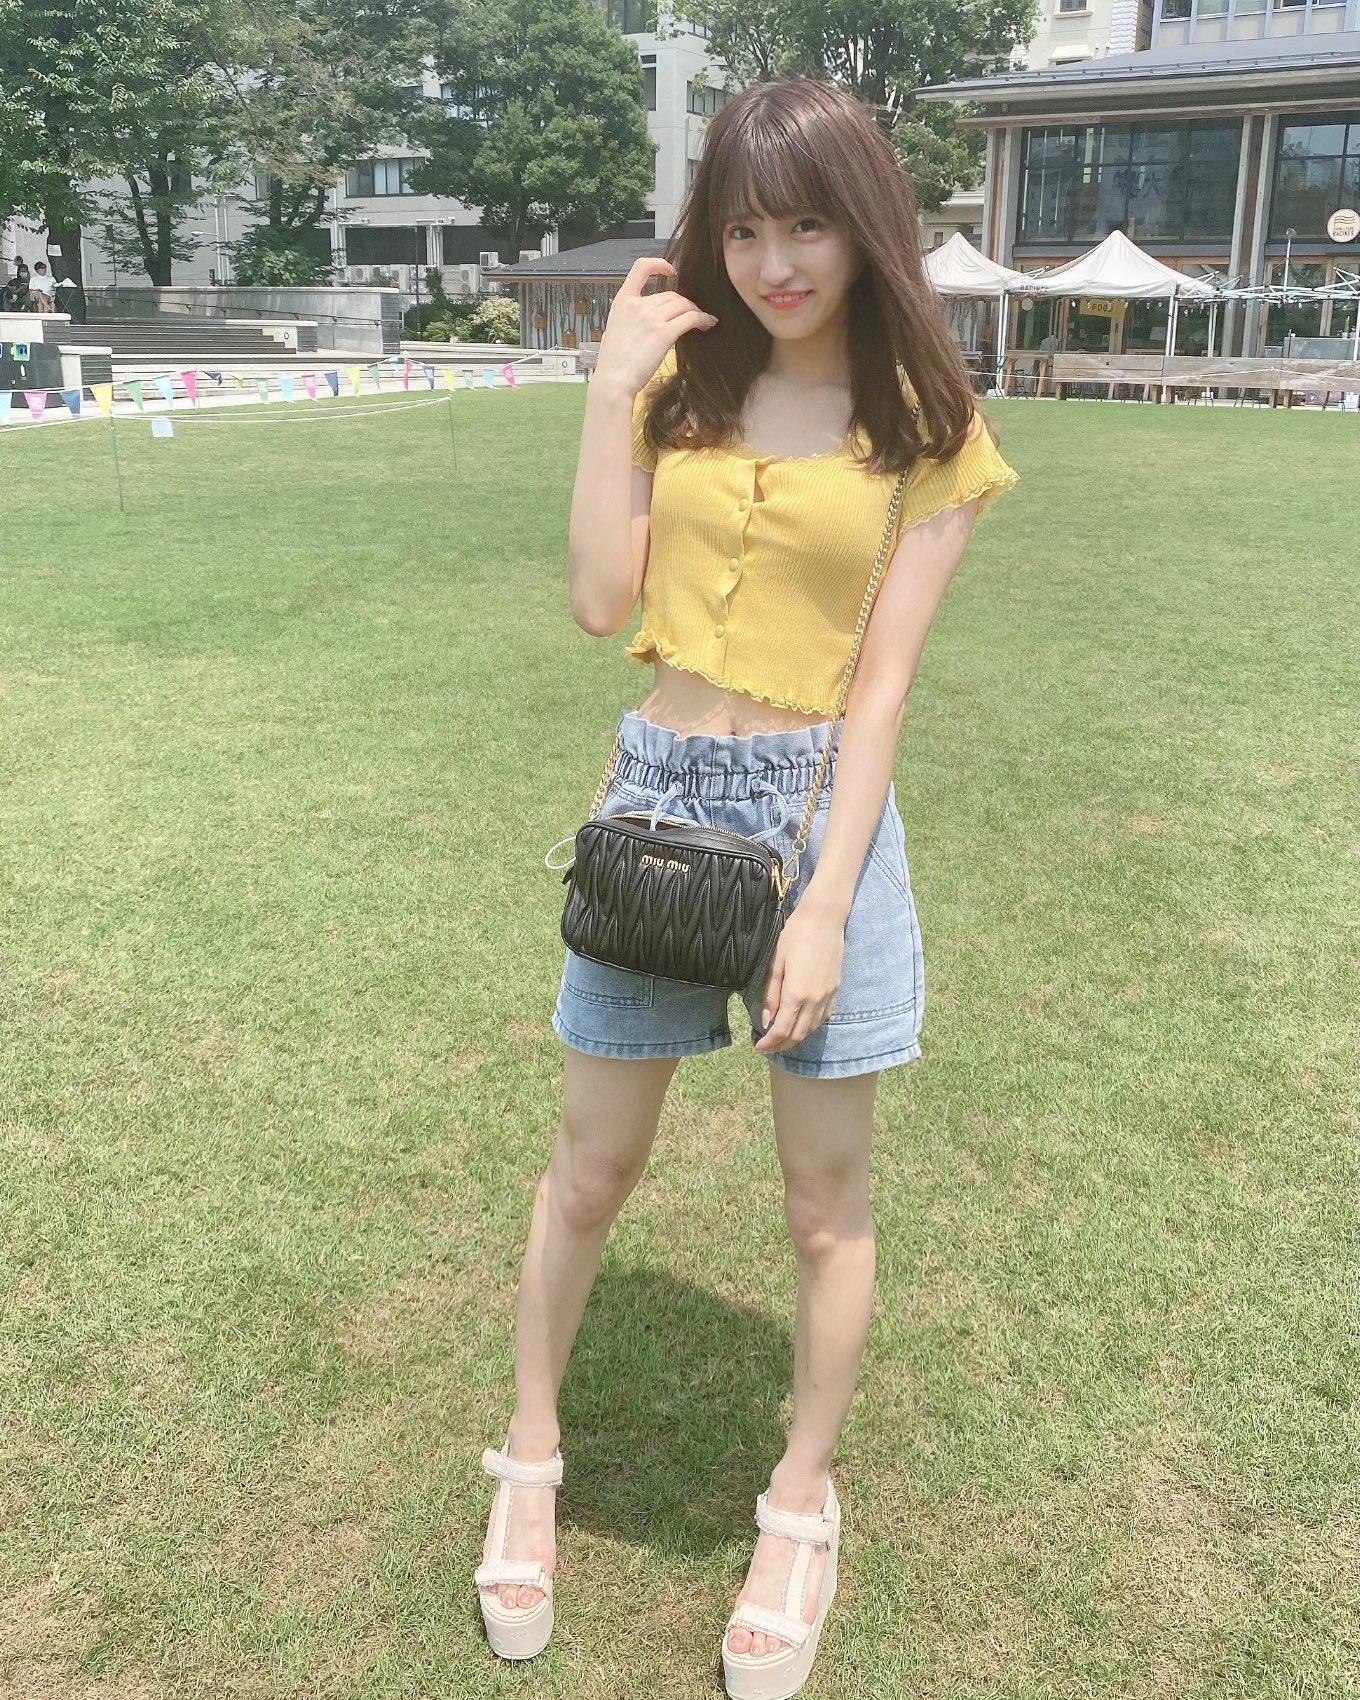 SKE48研究生森平莉子「可愛いへそチラ」スリムなボディにファン歓喜【写真2枚】の画像002